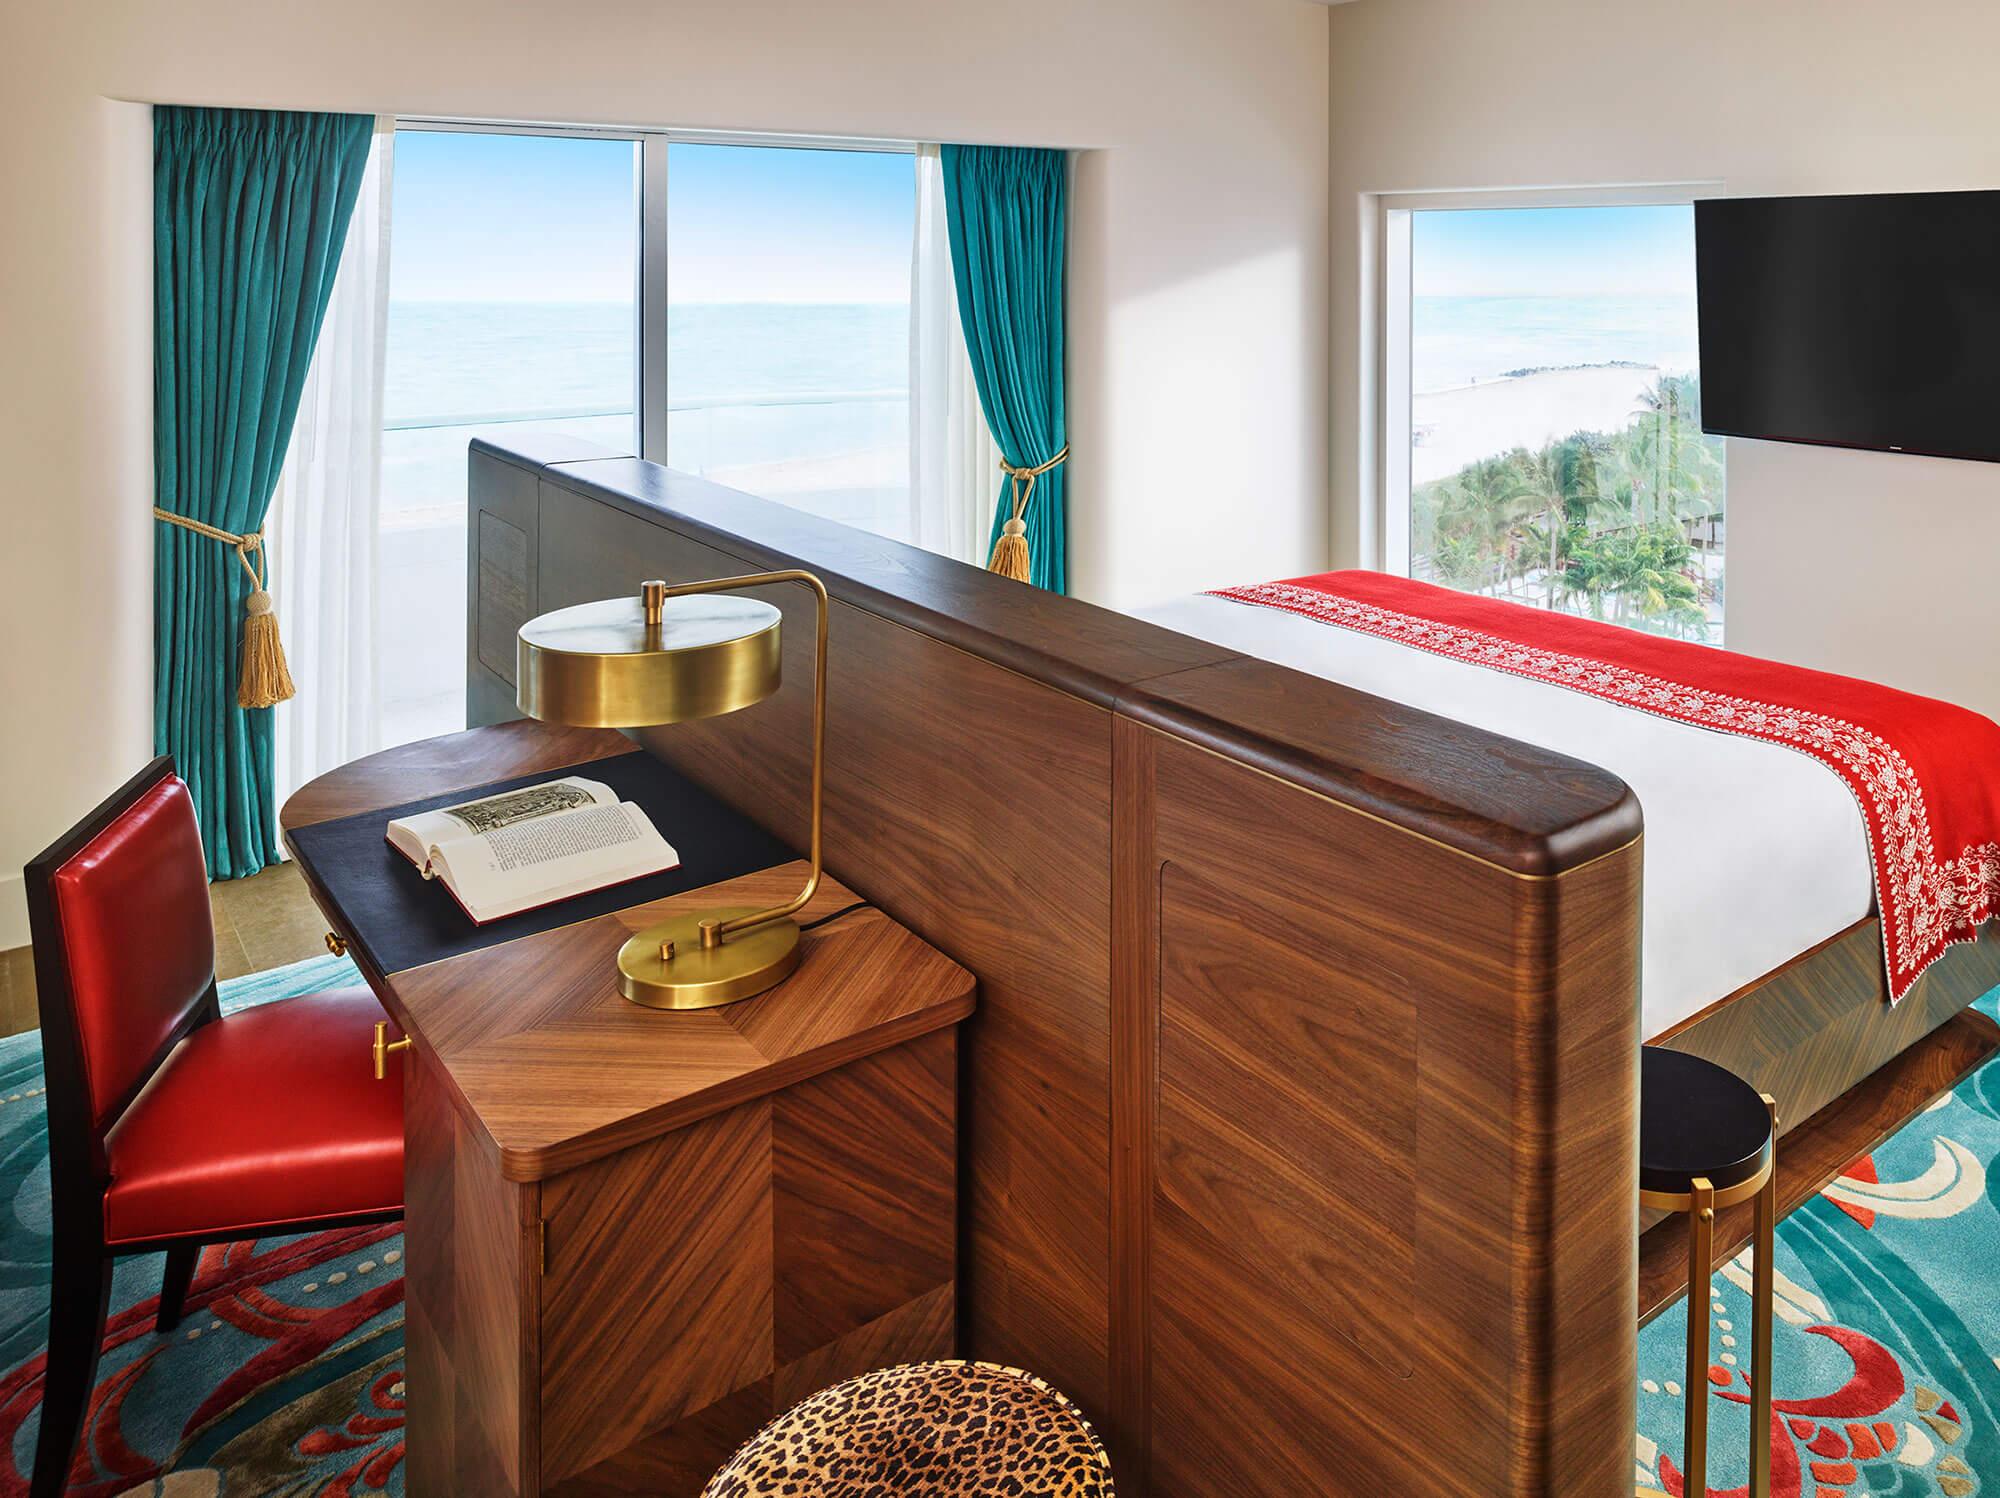 11_Rooms_Faena_hotel_809_RGB_Oceanfront_Corner_Suite-00.jpg